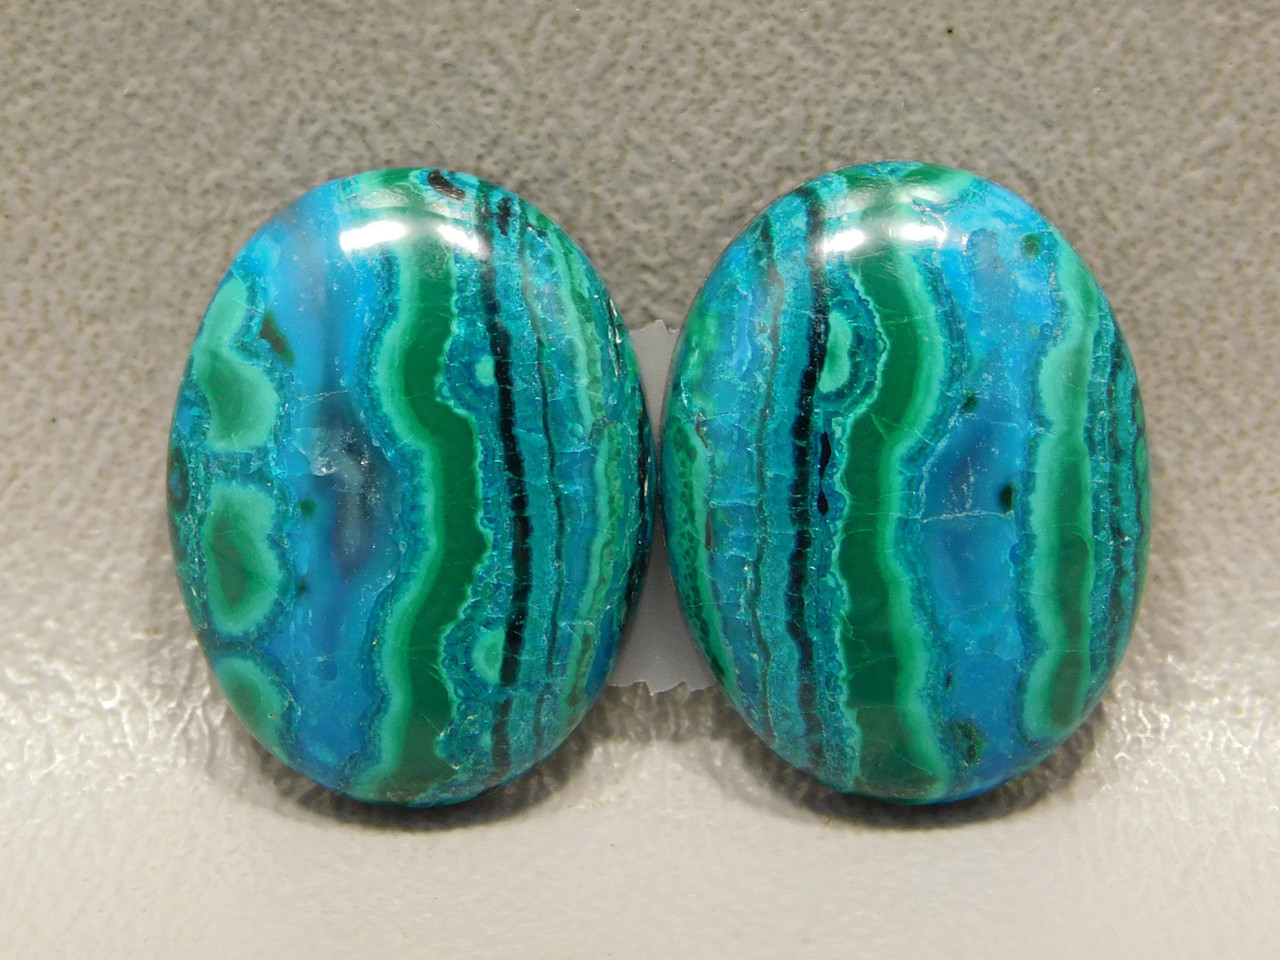 Chrysocolla Malachite High Grade Stones Blue Green Cabochons #25